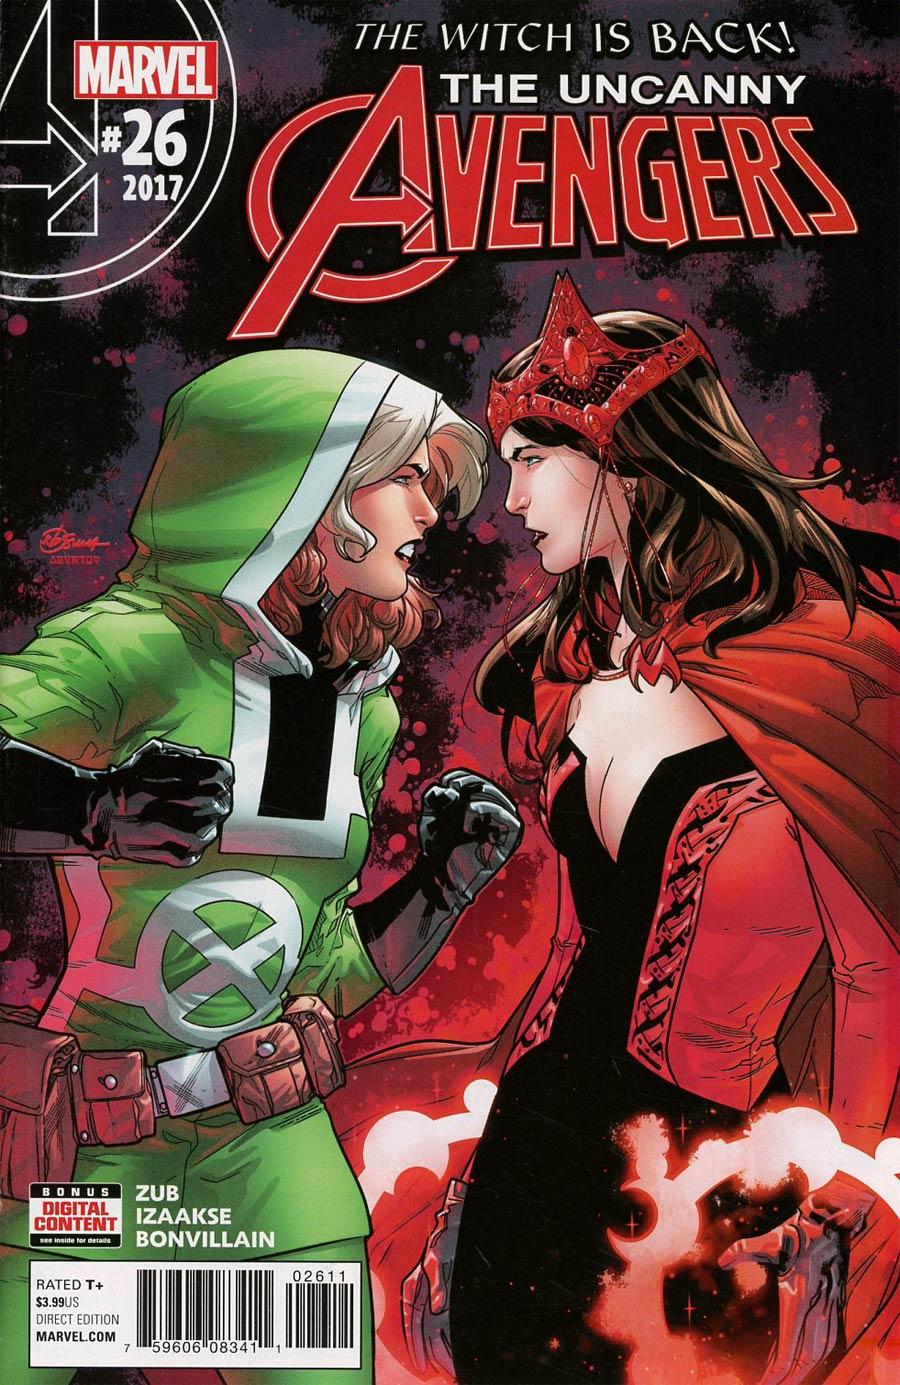 Uncanny Avengers Vol 3 #26